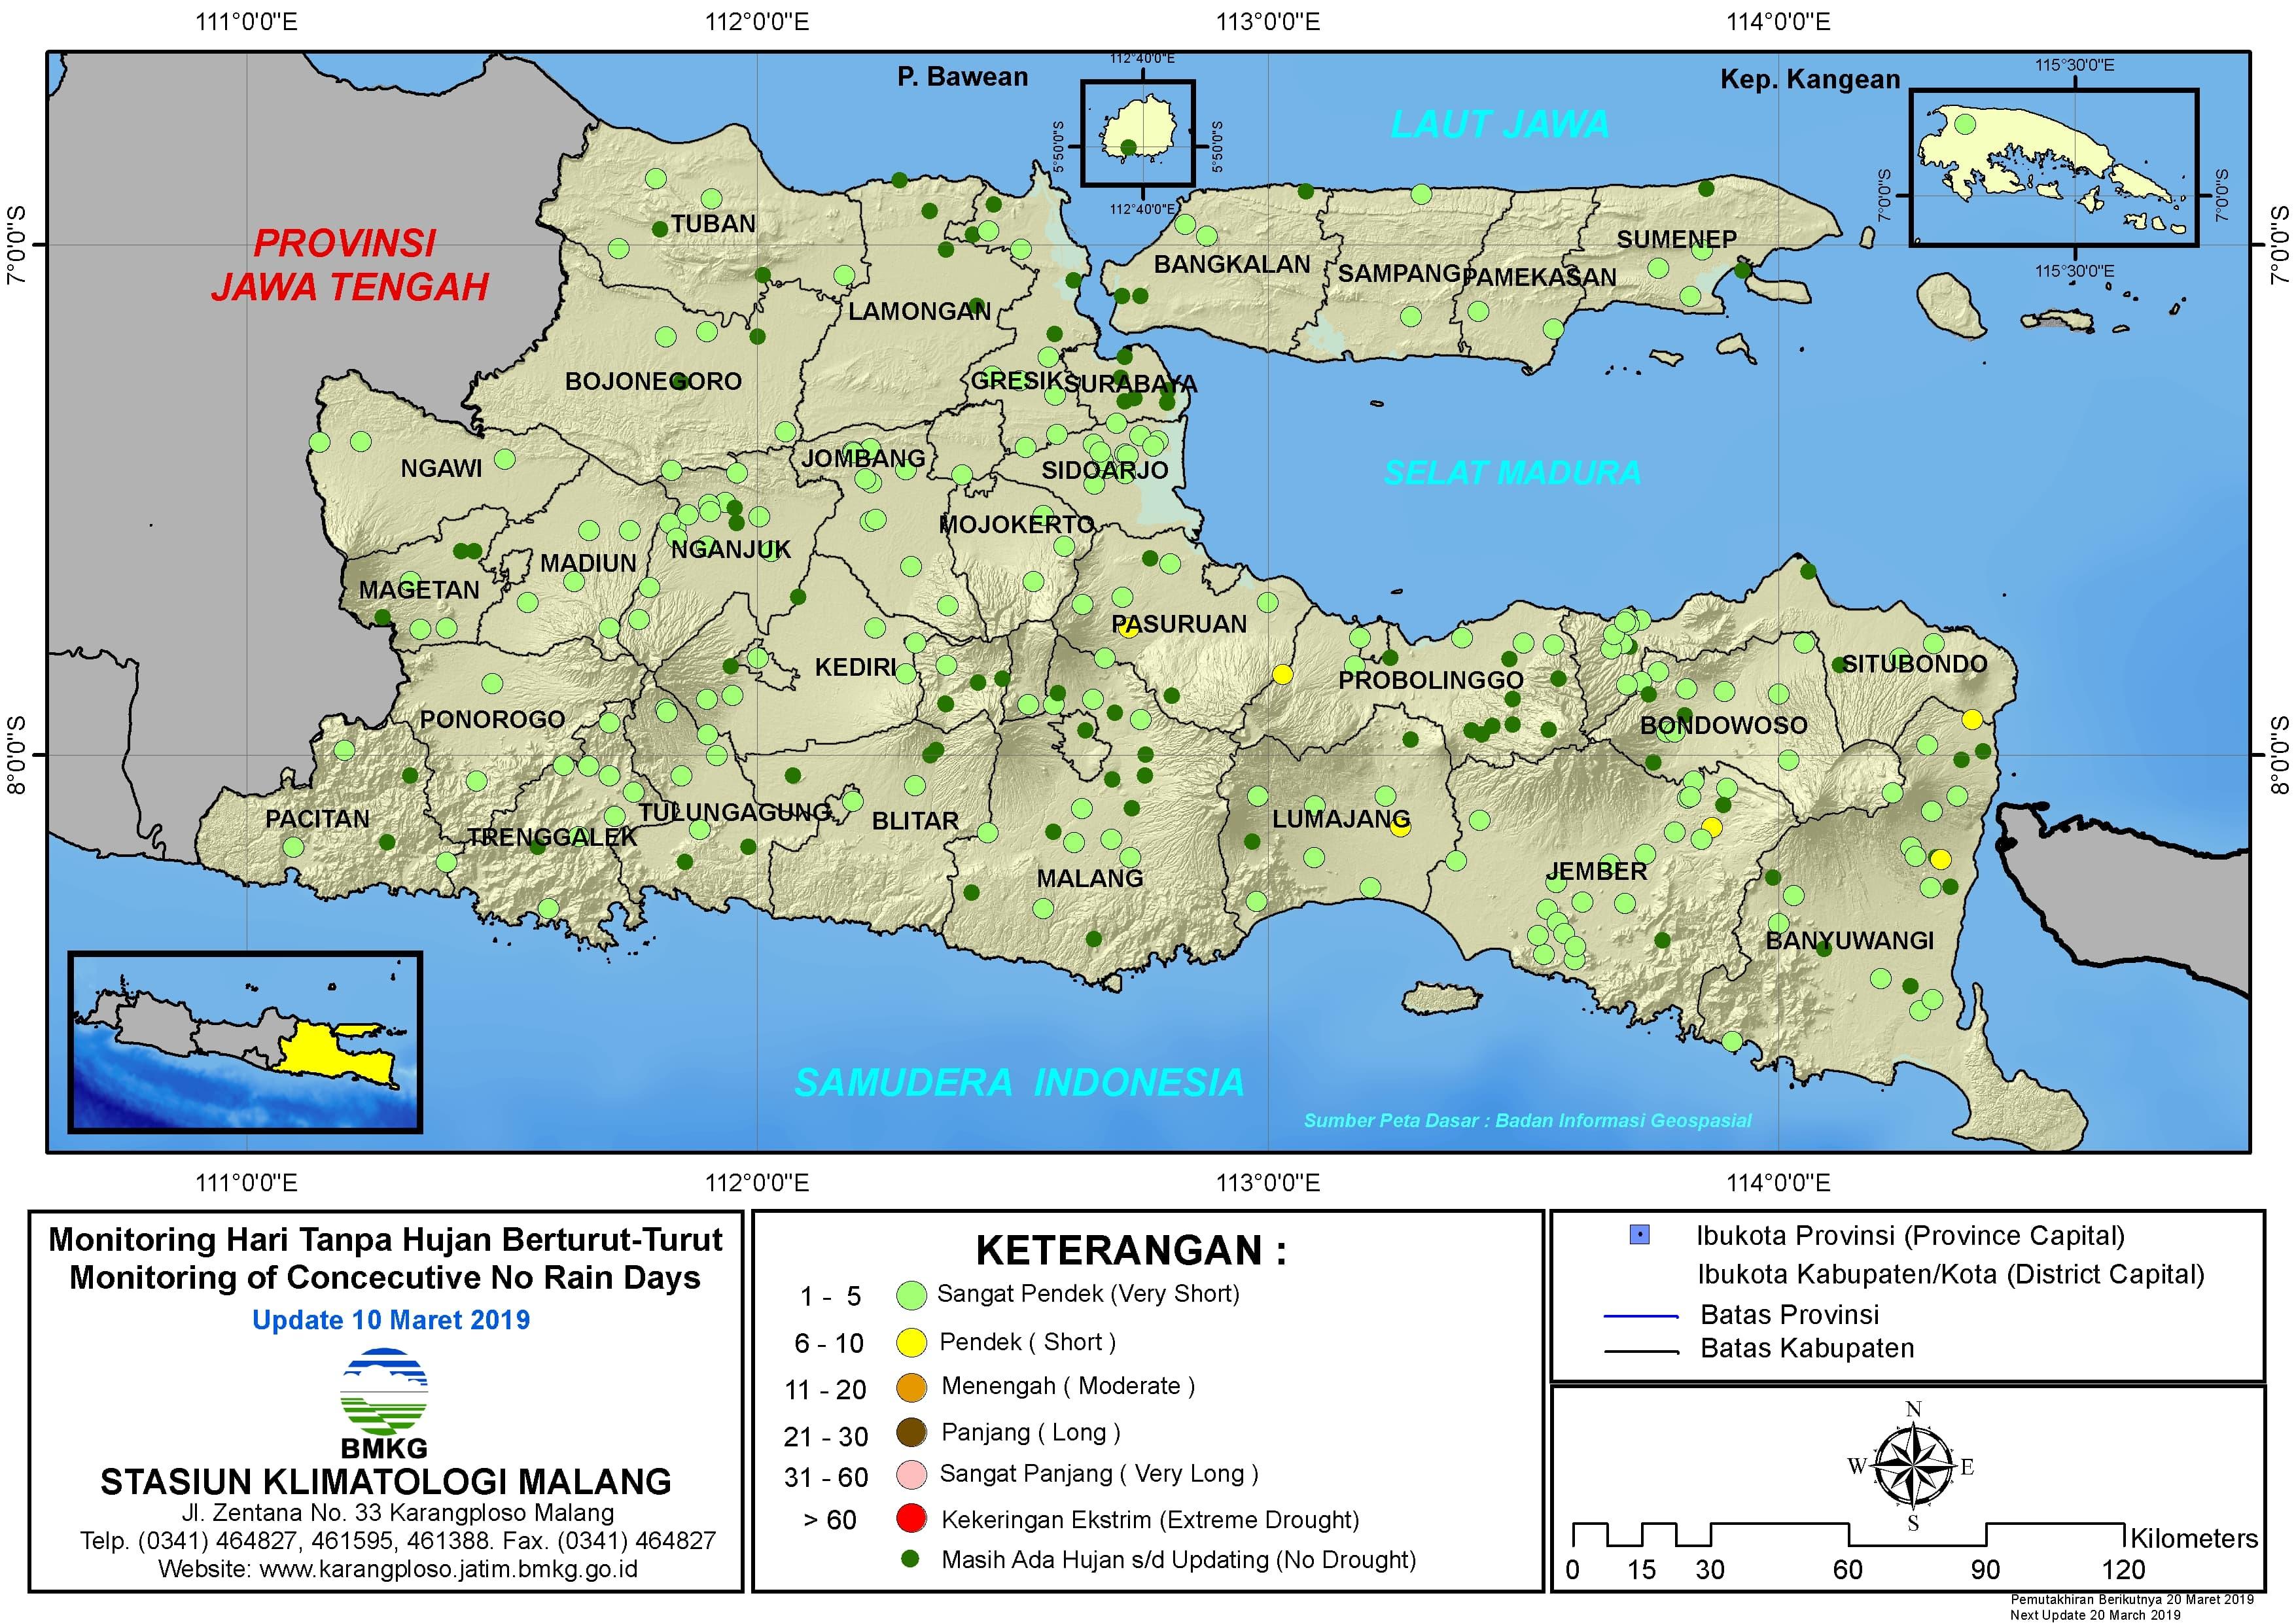 Peta Monitoring Hari Tanpa Hujan Berturut Turut Update 10 Maret 2019 di Provinsi Jawa Timur